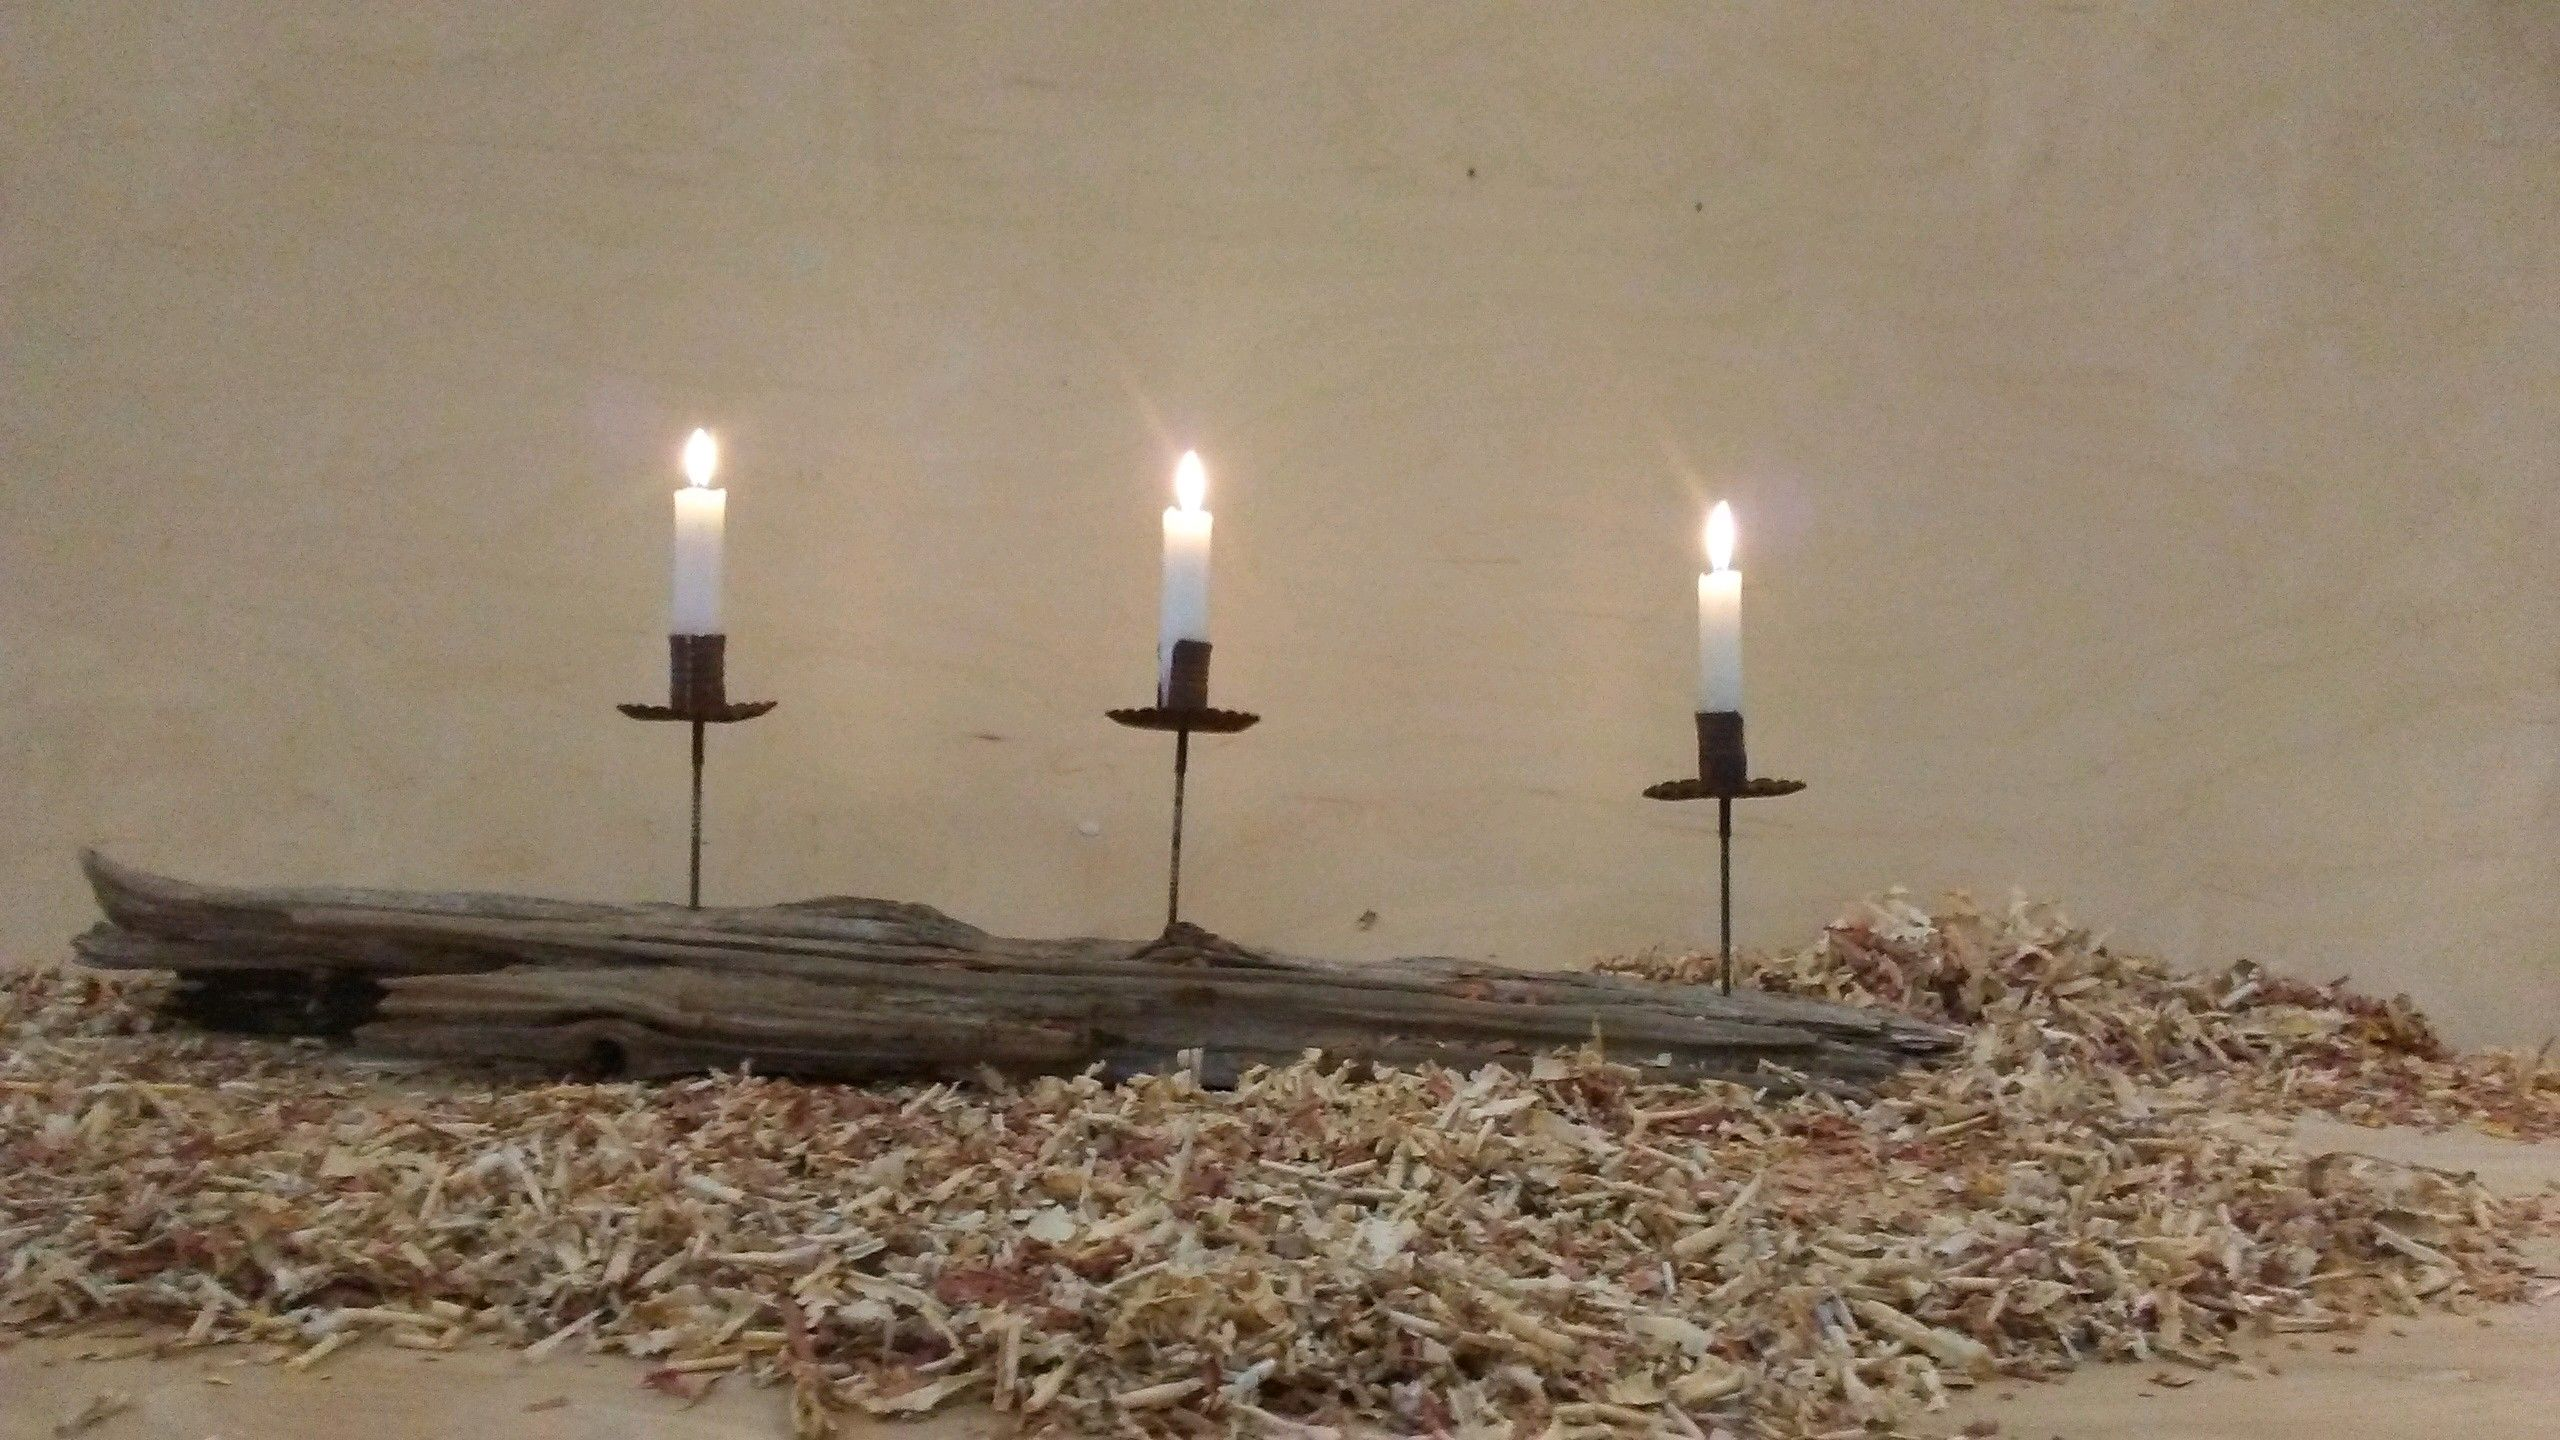 beach theme lighting. Driftwood Three Candle Light. #Driftwood#lights #candle#style#wood#distressedtin#light #loveit#handmade#America#Bridgeport#connecticut Beach Theme Lighting A